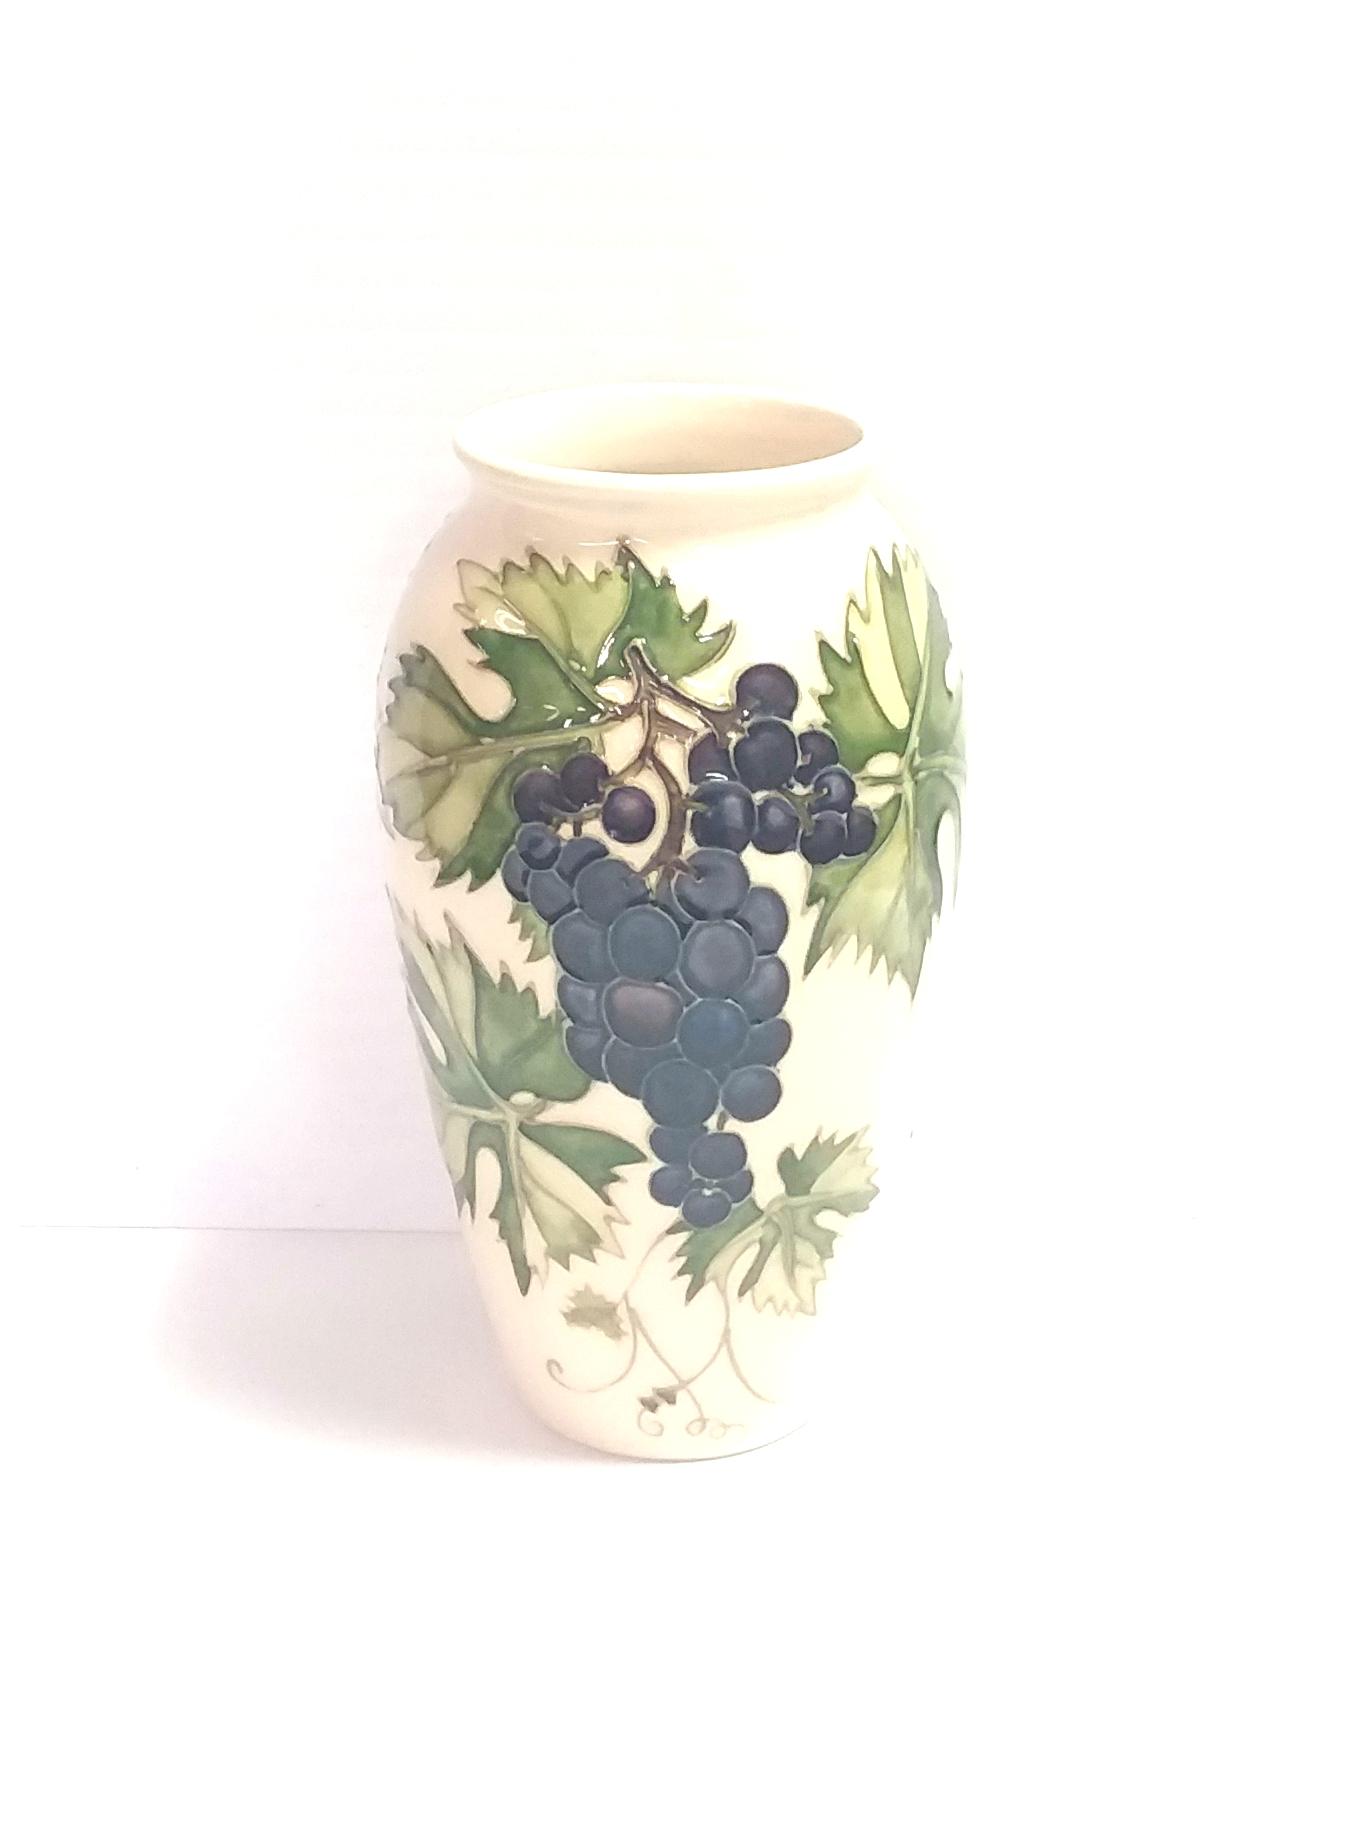 Moorecroft Grapes Vase